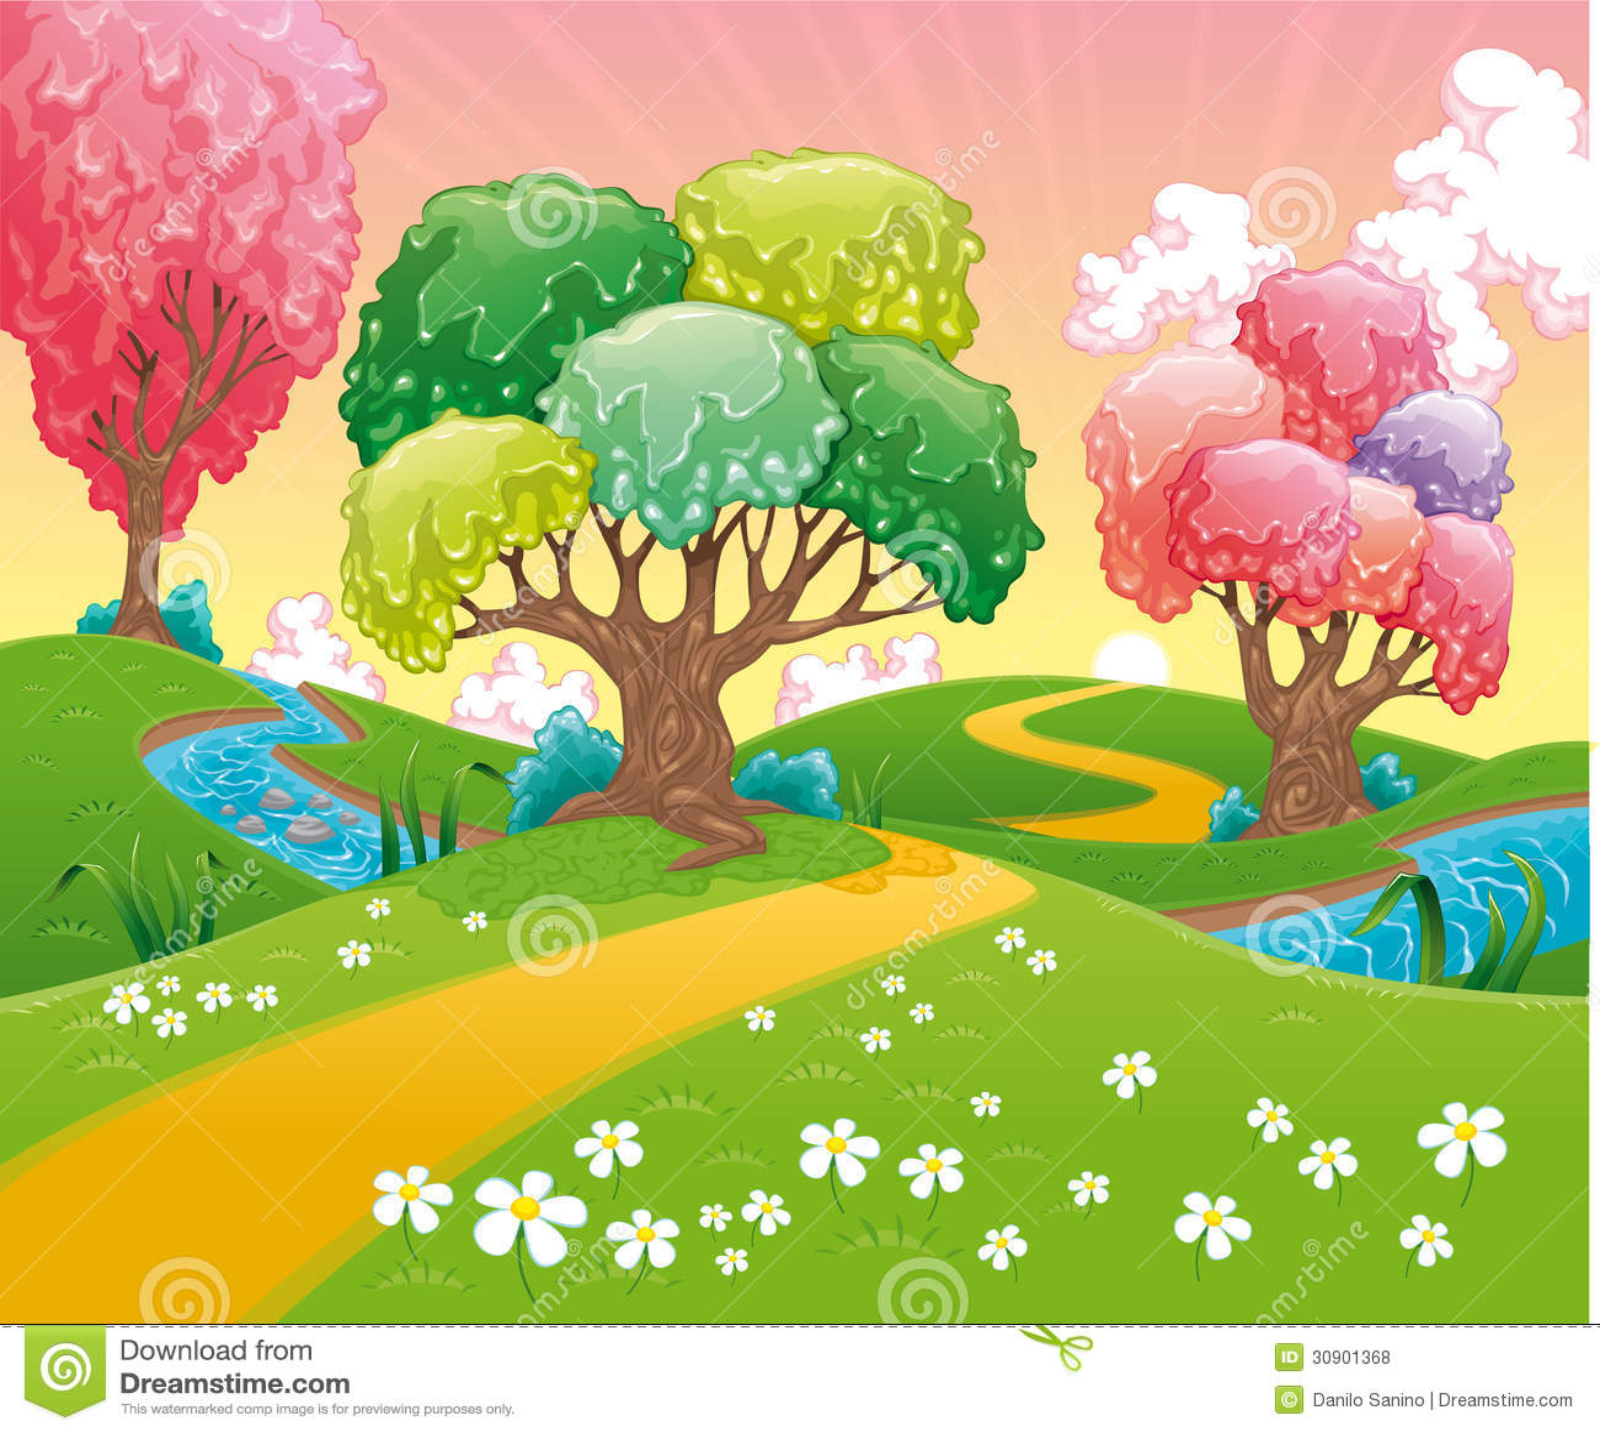 Landscape Illustration Vector Free: Fantasy Landscape. Stock Vector. Illustration Of